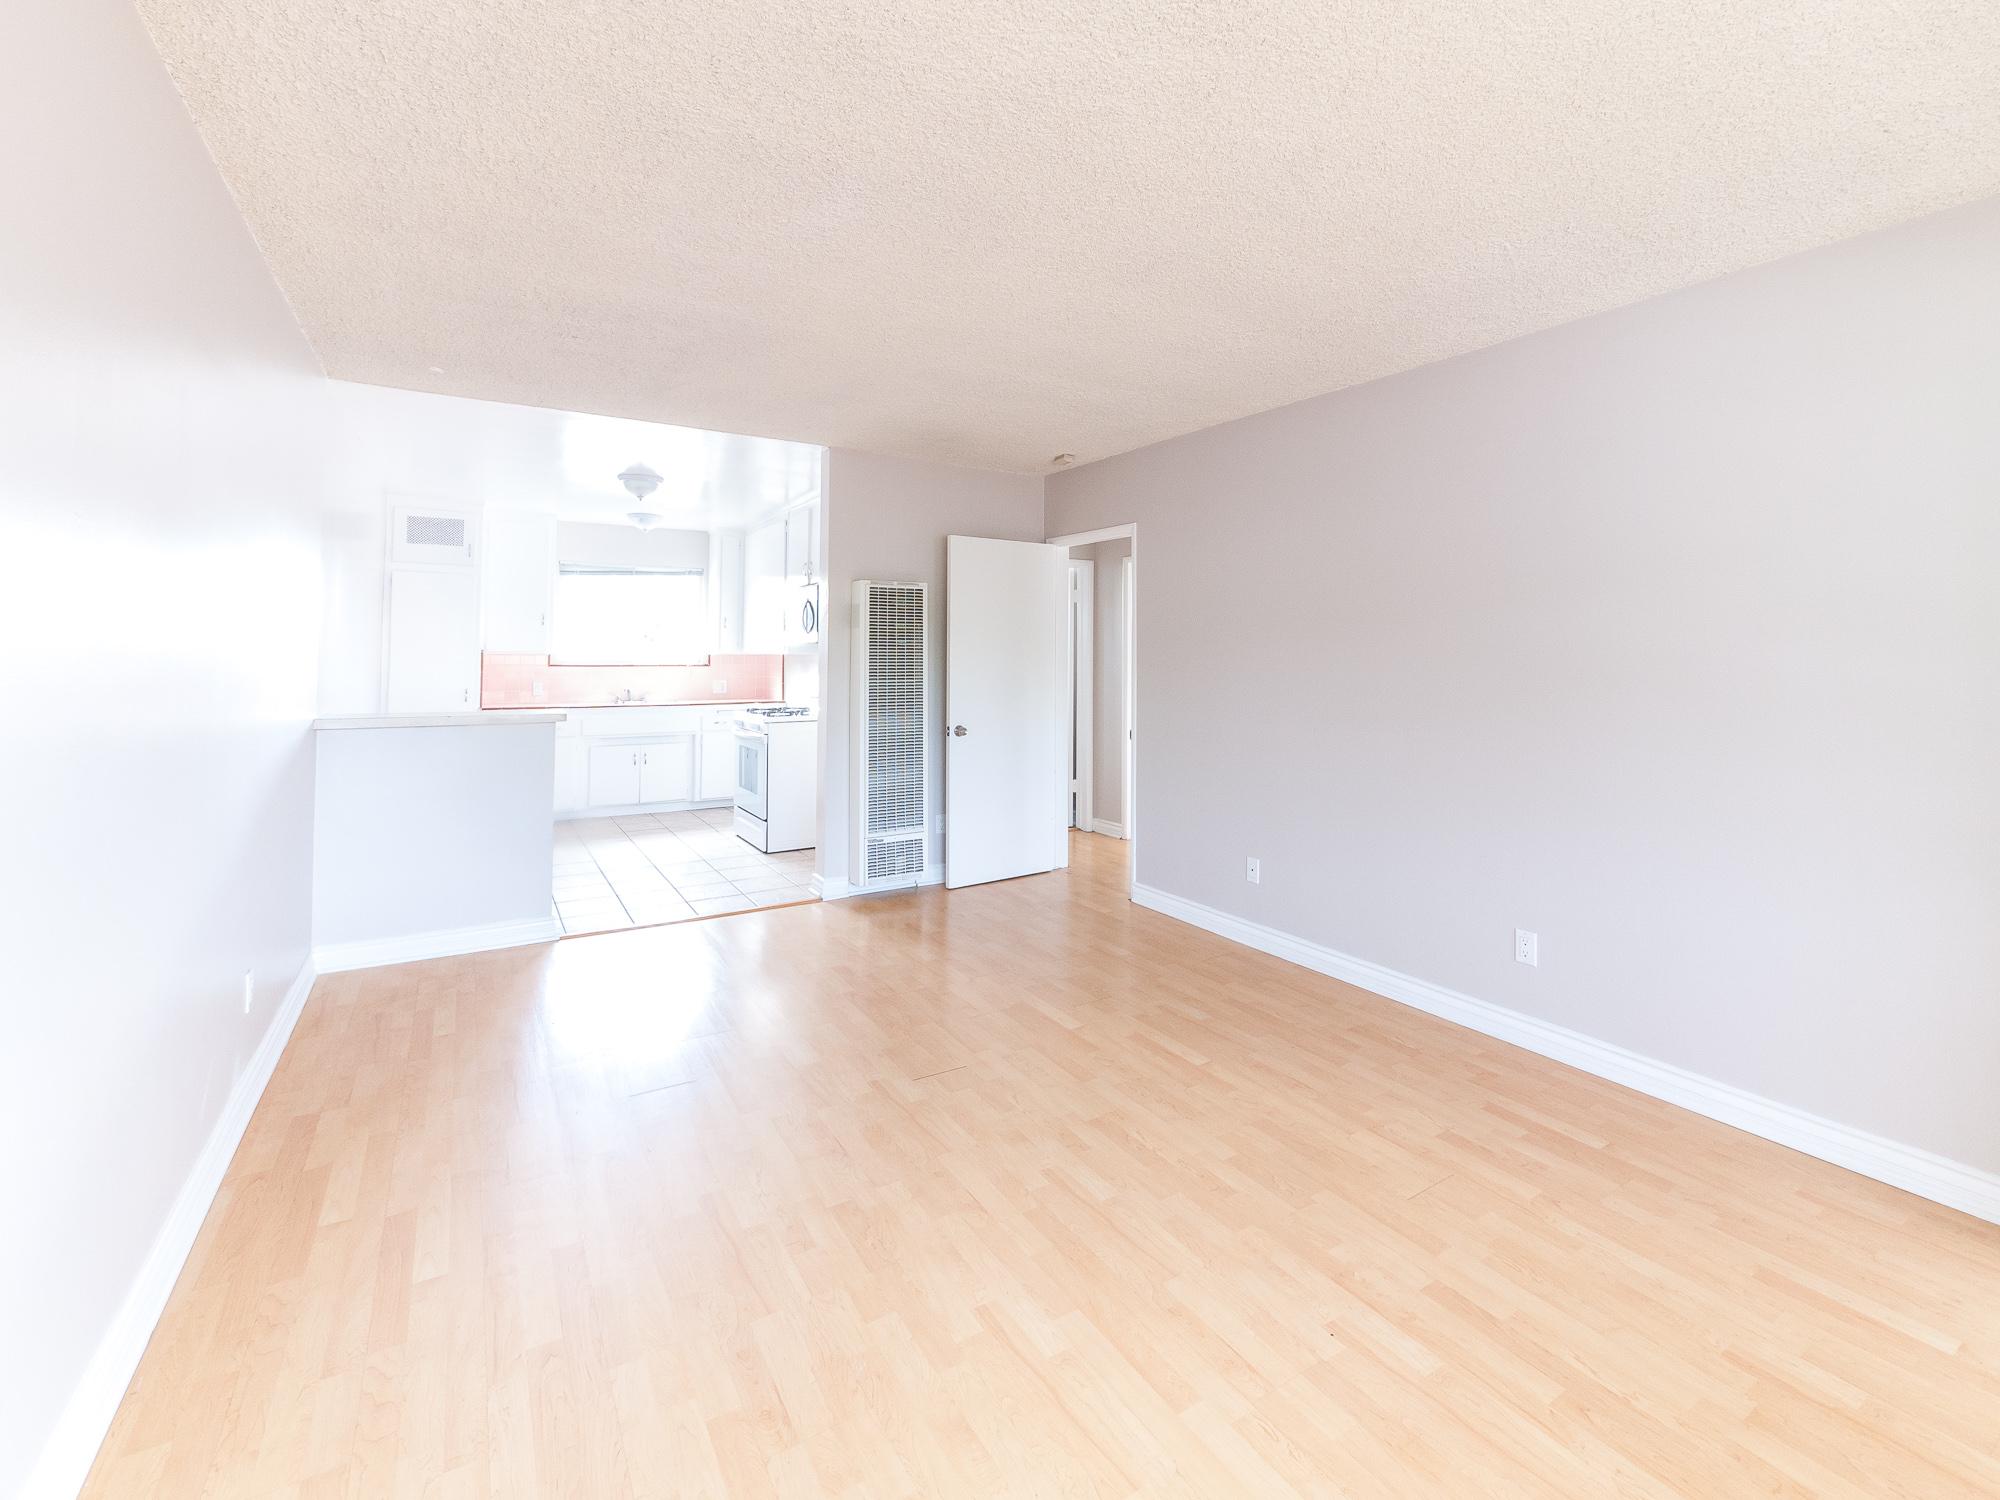 Eagle Rock Apartment | Upper Unit | Assigned Parking Space